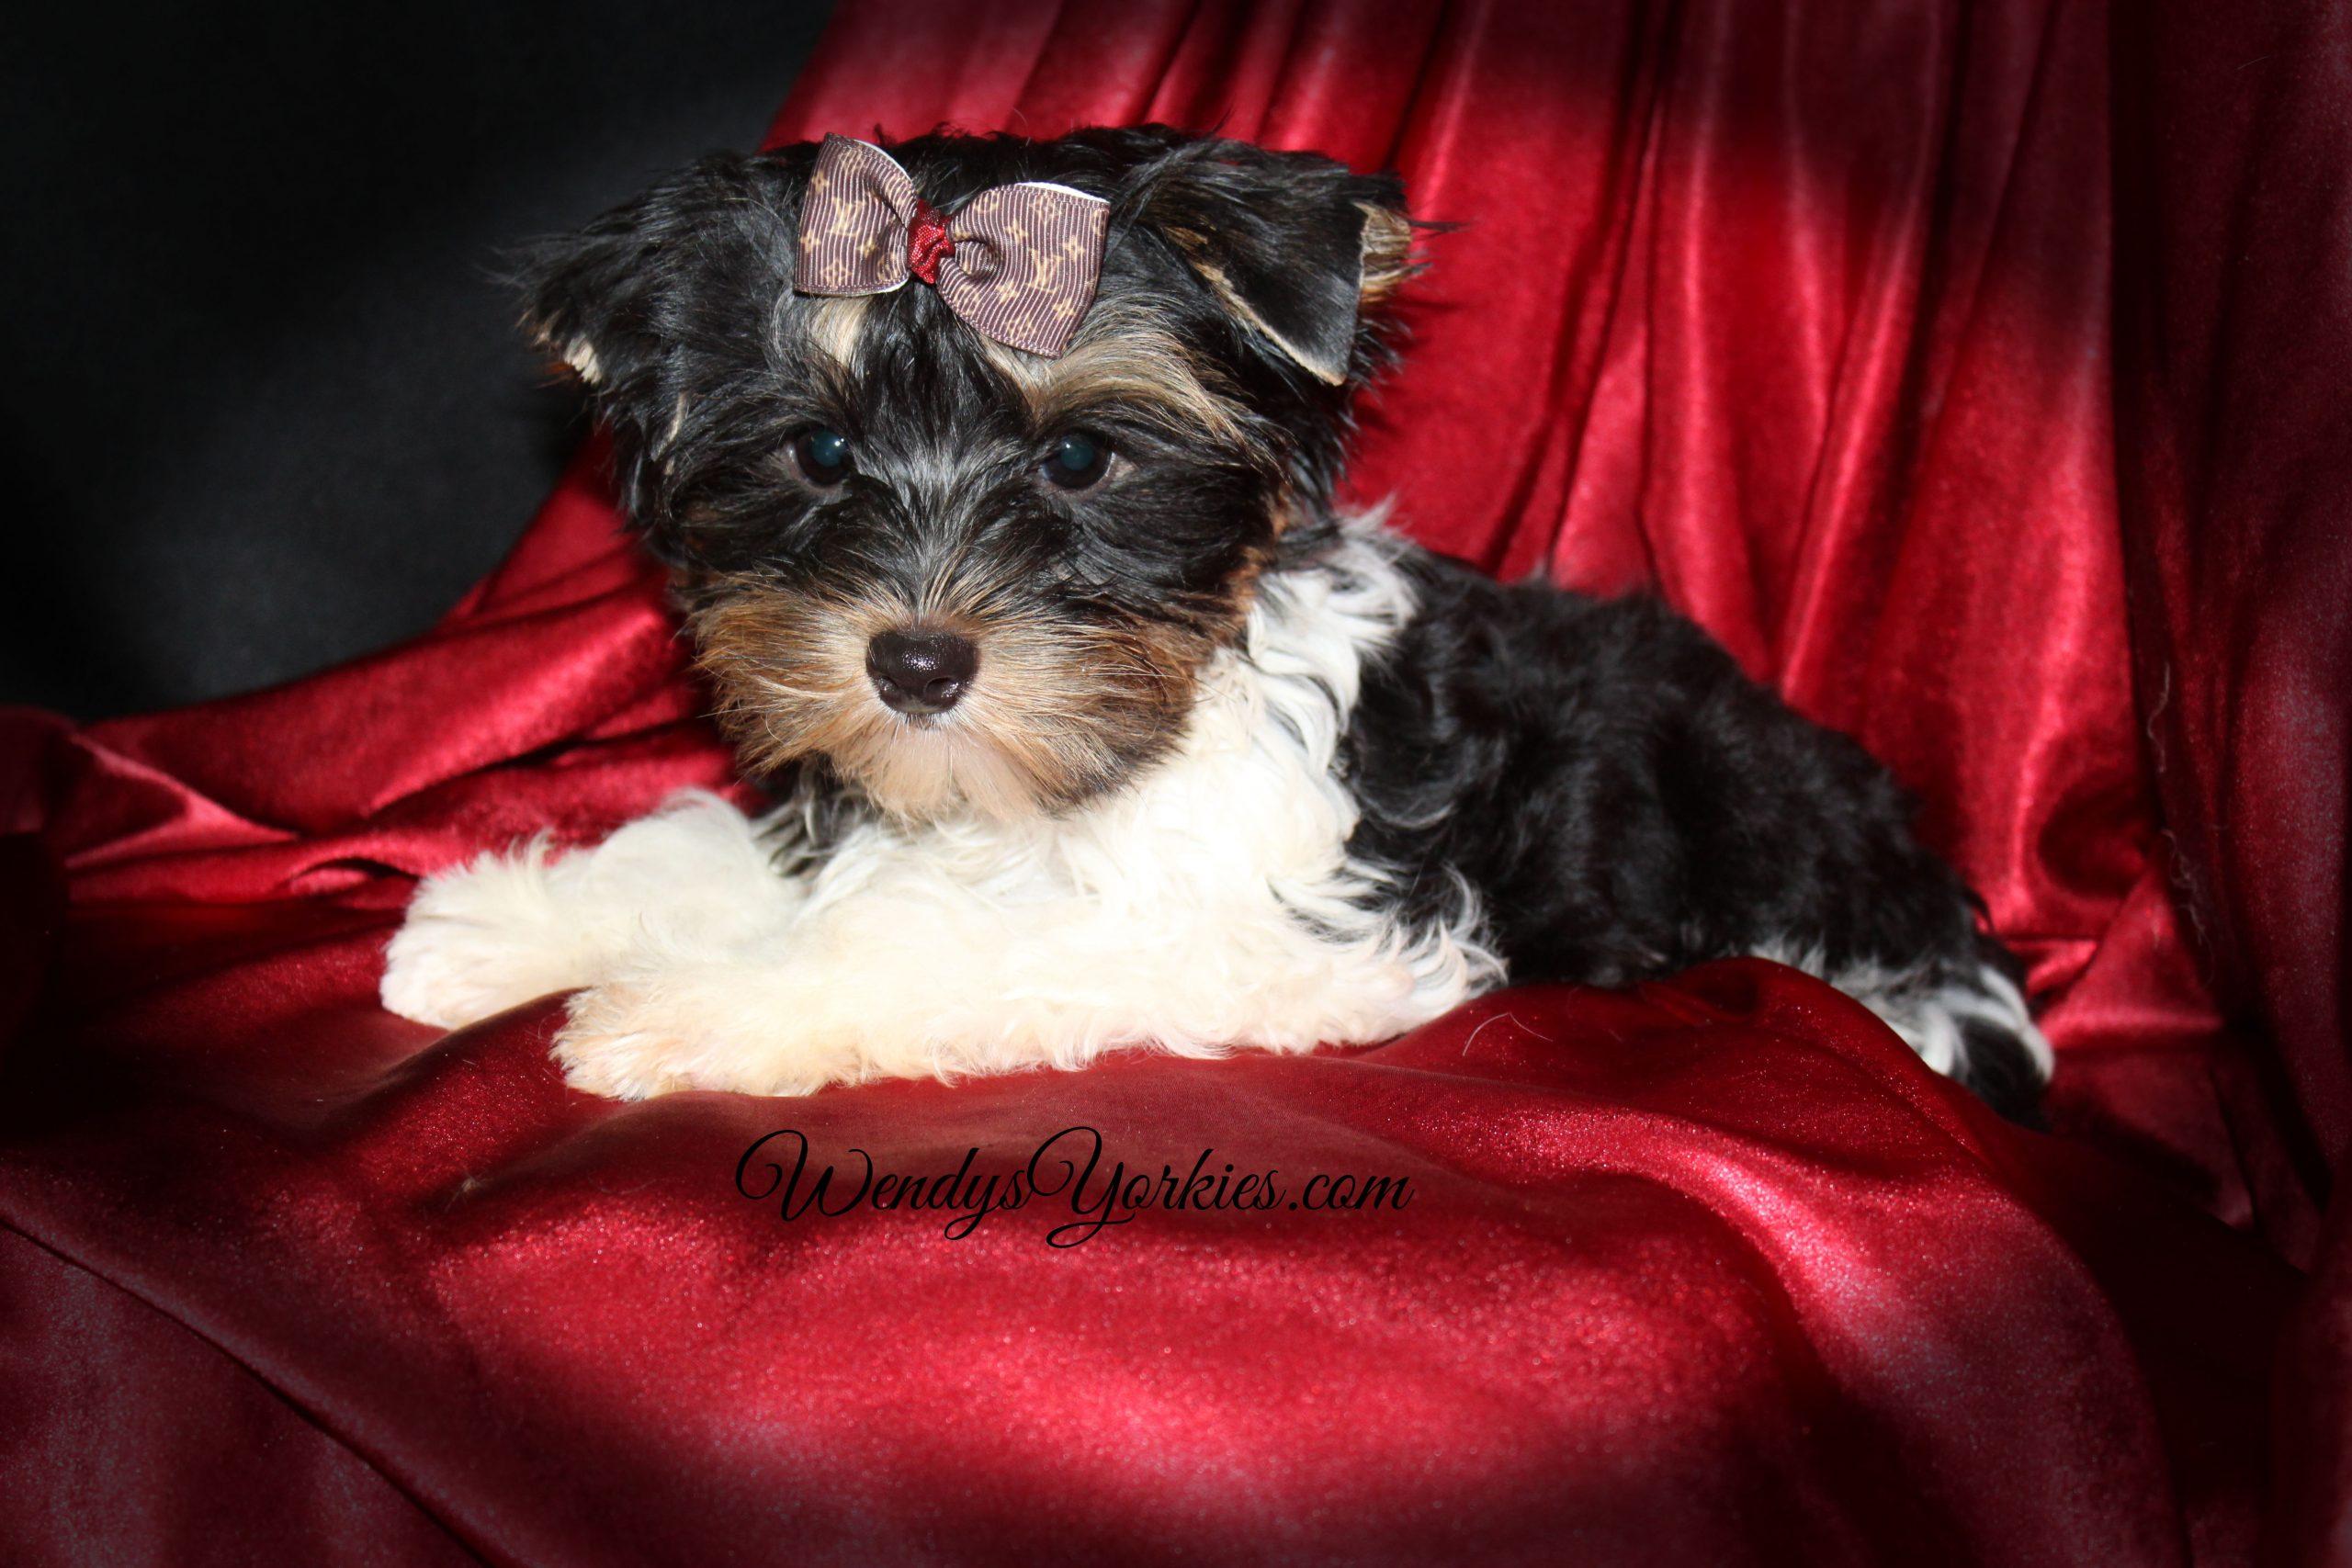 Male Parti yorkie puppy, Shi pm1, WendysYorkies.com